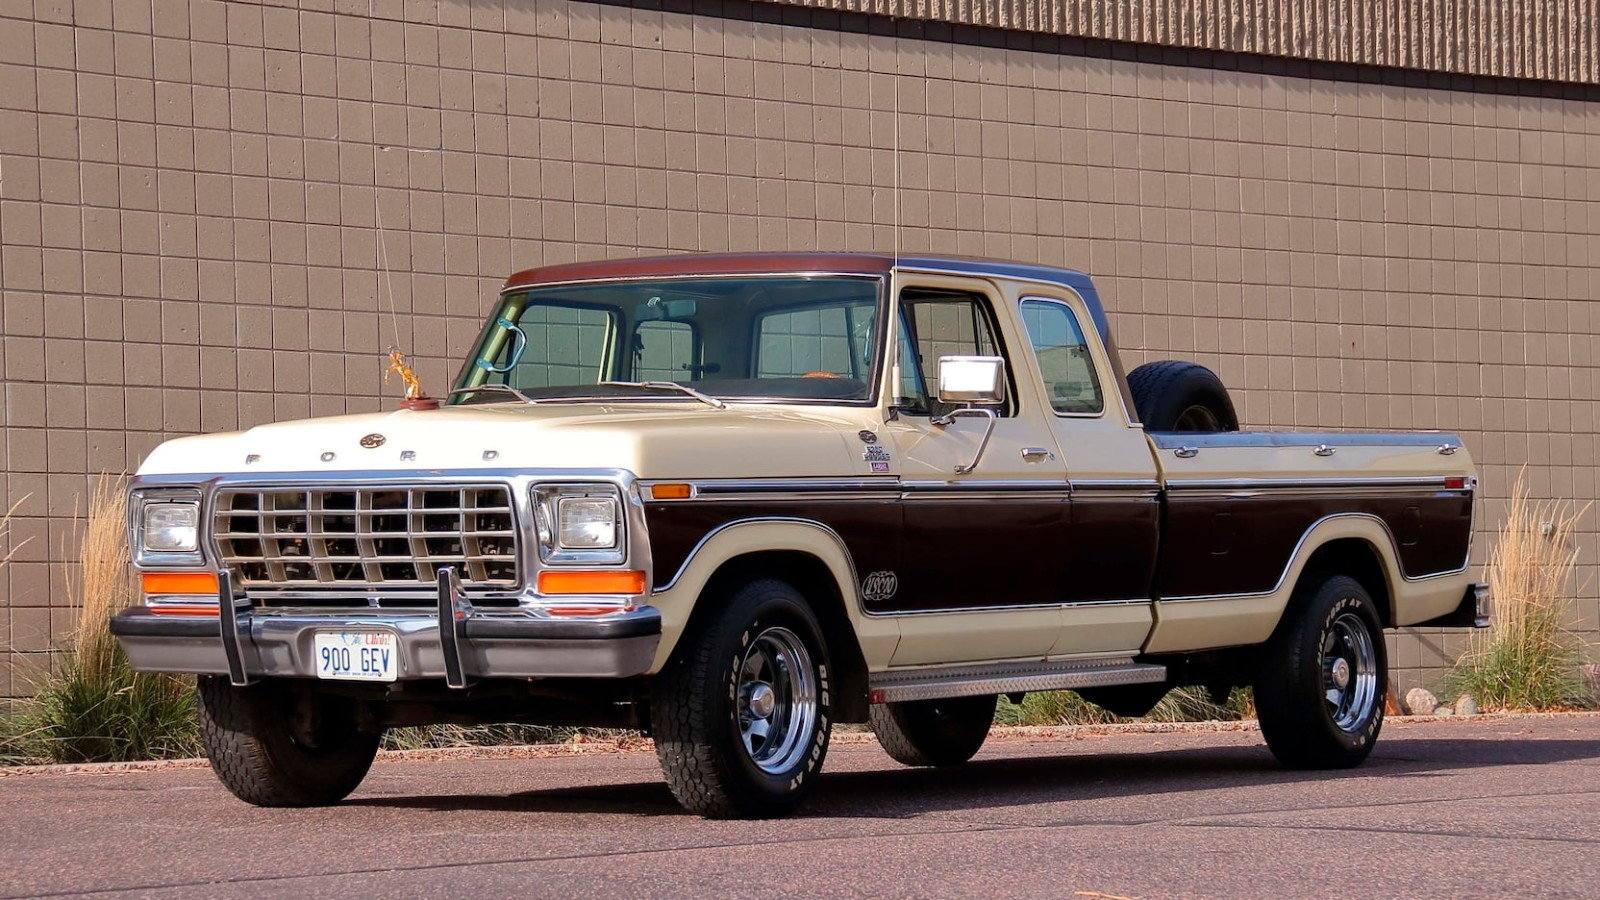 John Wayne S 78 Ford F 350 Also A Super Rare Supercab Ford Trucks